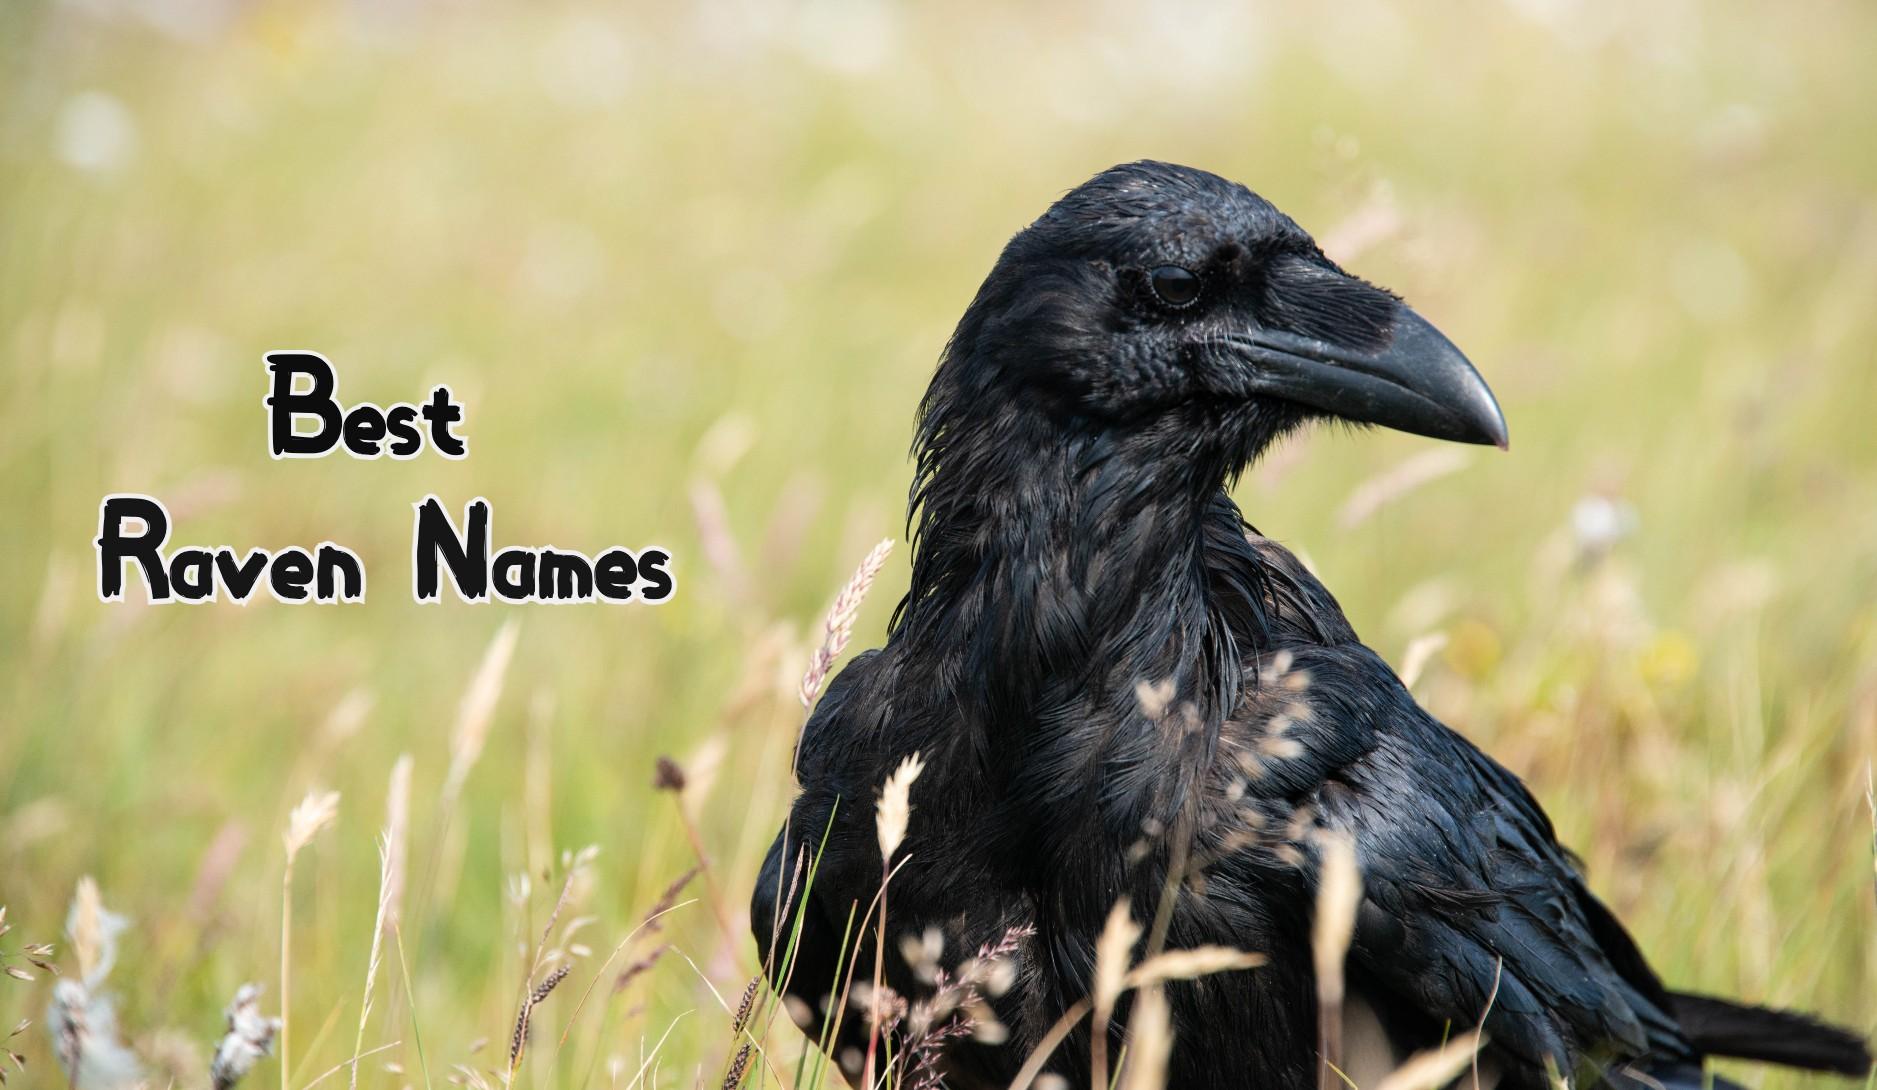 best-raven-names